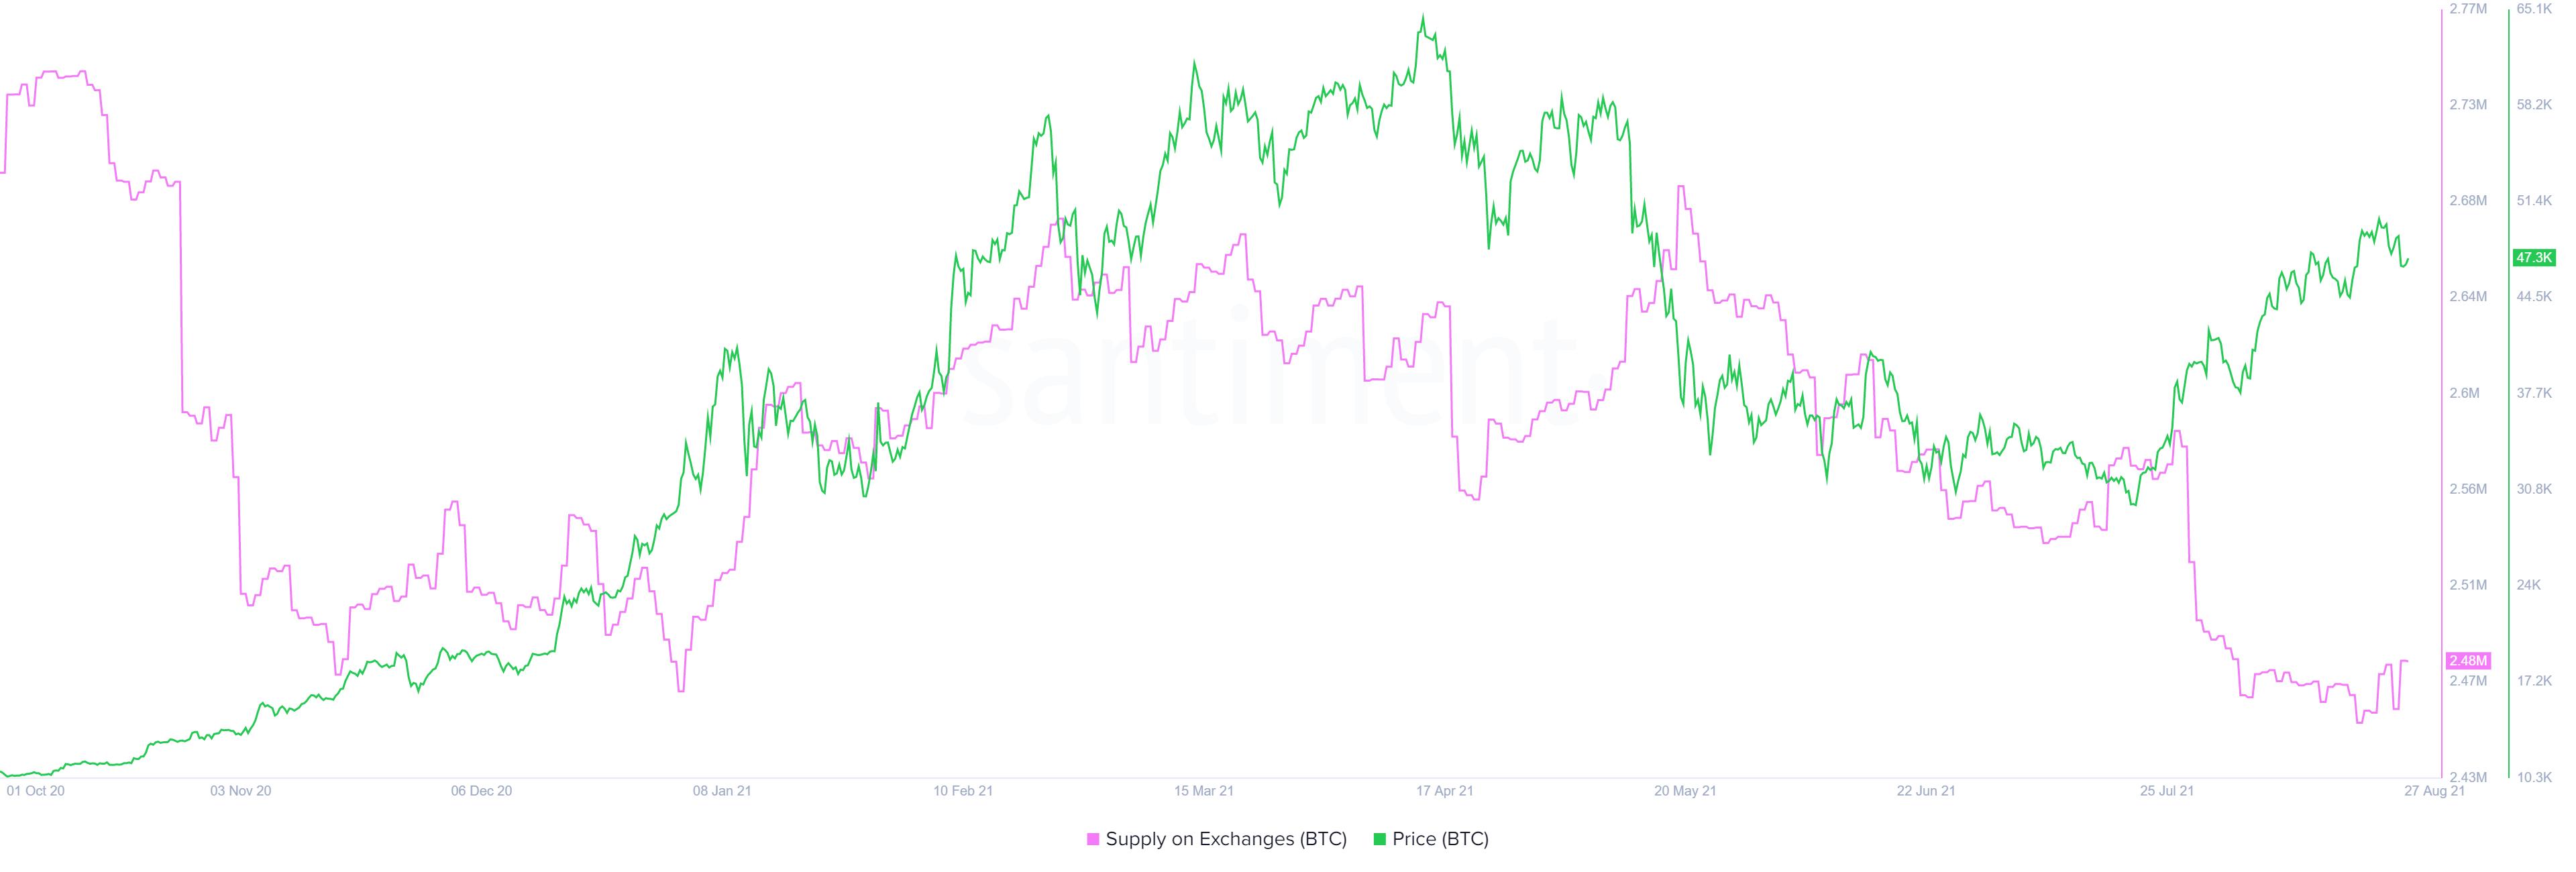 BTC supply on exchange chart